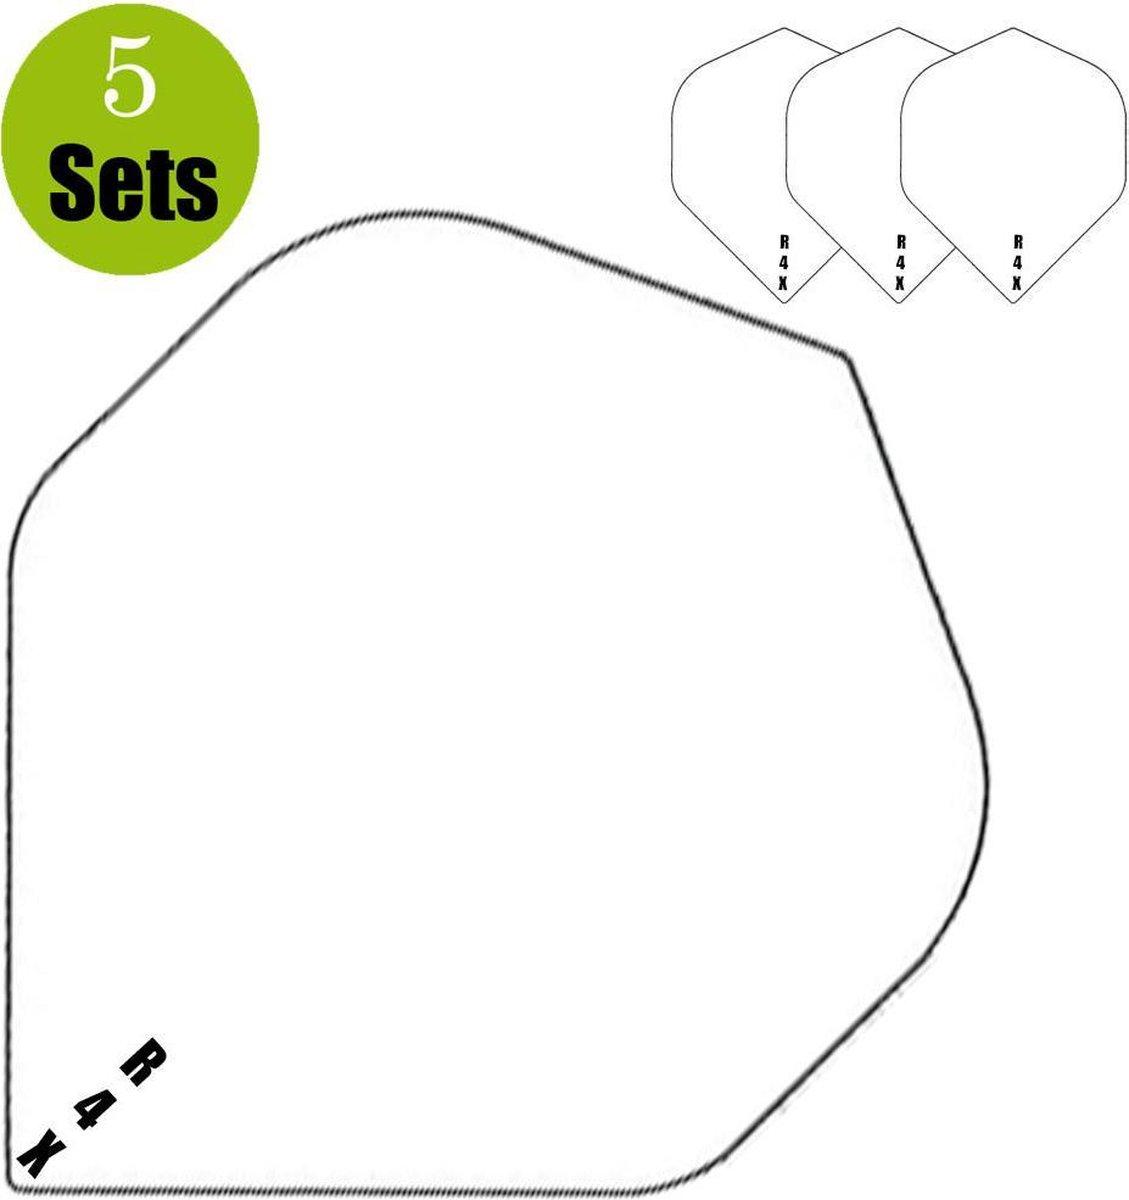 Ruthless R4X Dartflights - Wit- (5 Sets)